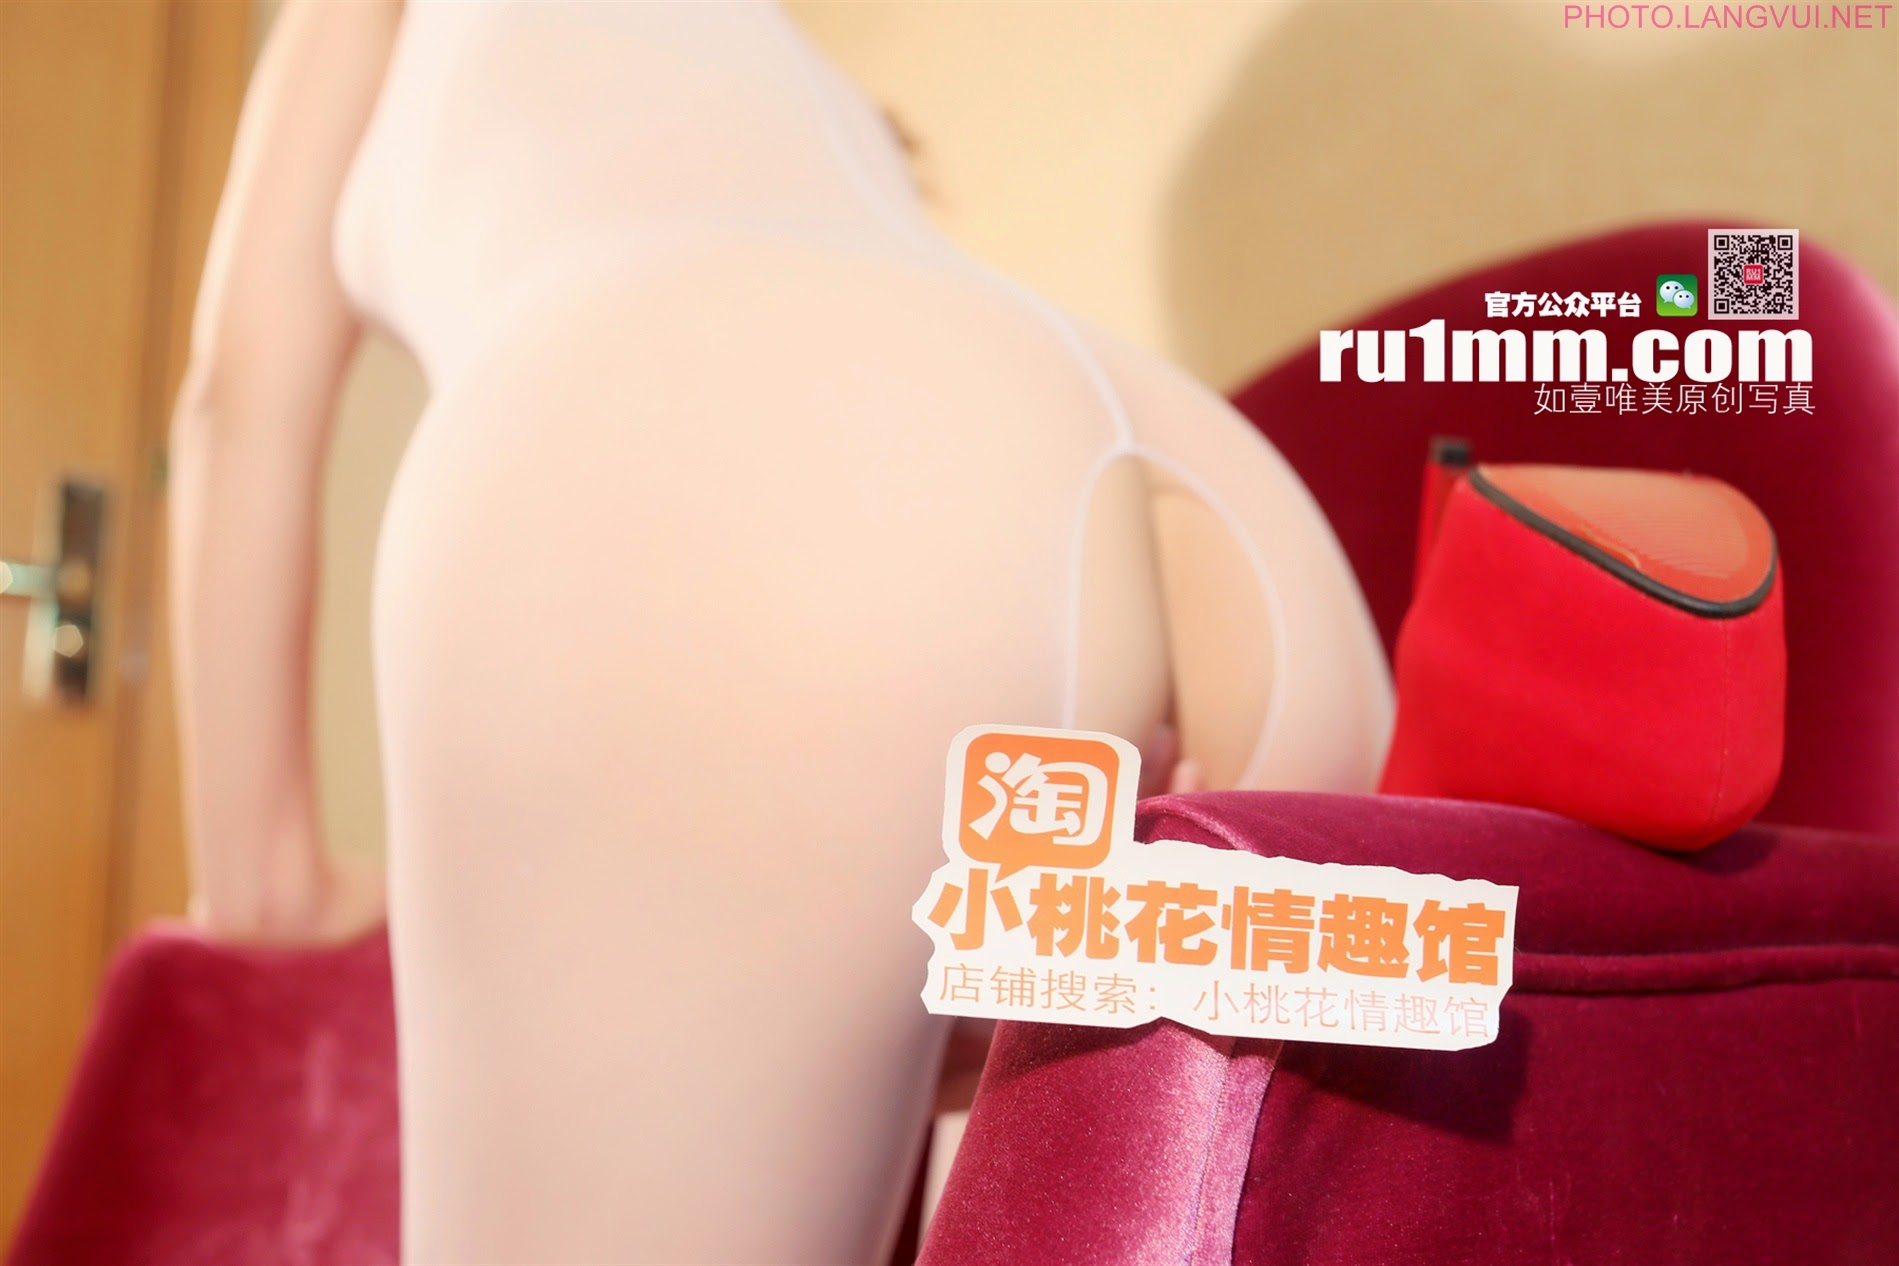 RU1MM No 129